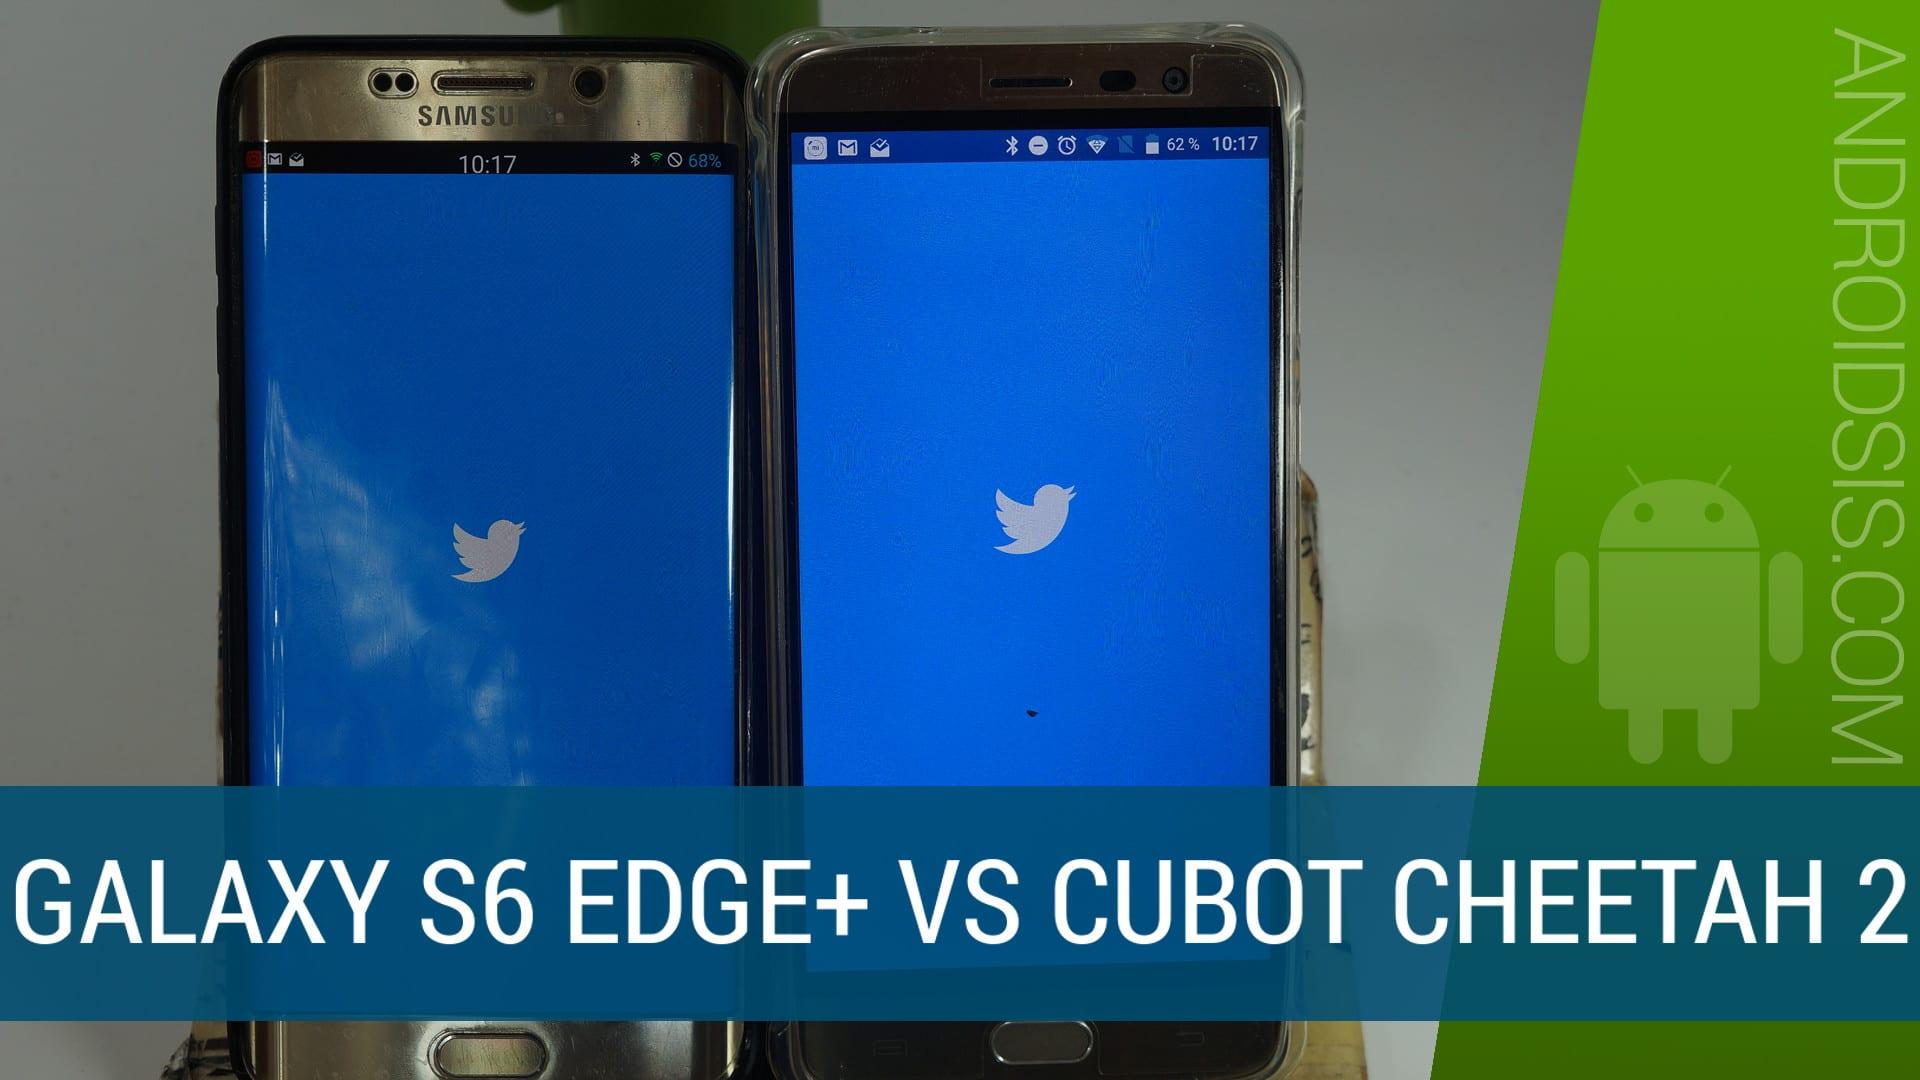 Test de velocidad Samsung Galaxy S6 Edge Plus VS Cubot Cheetah 2